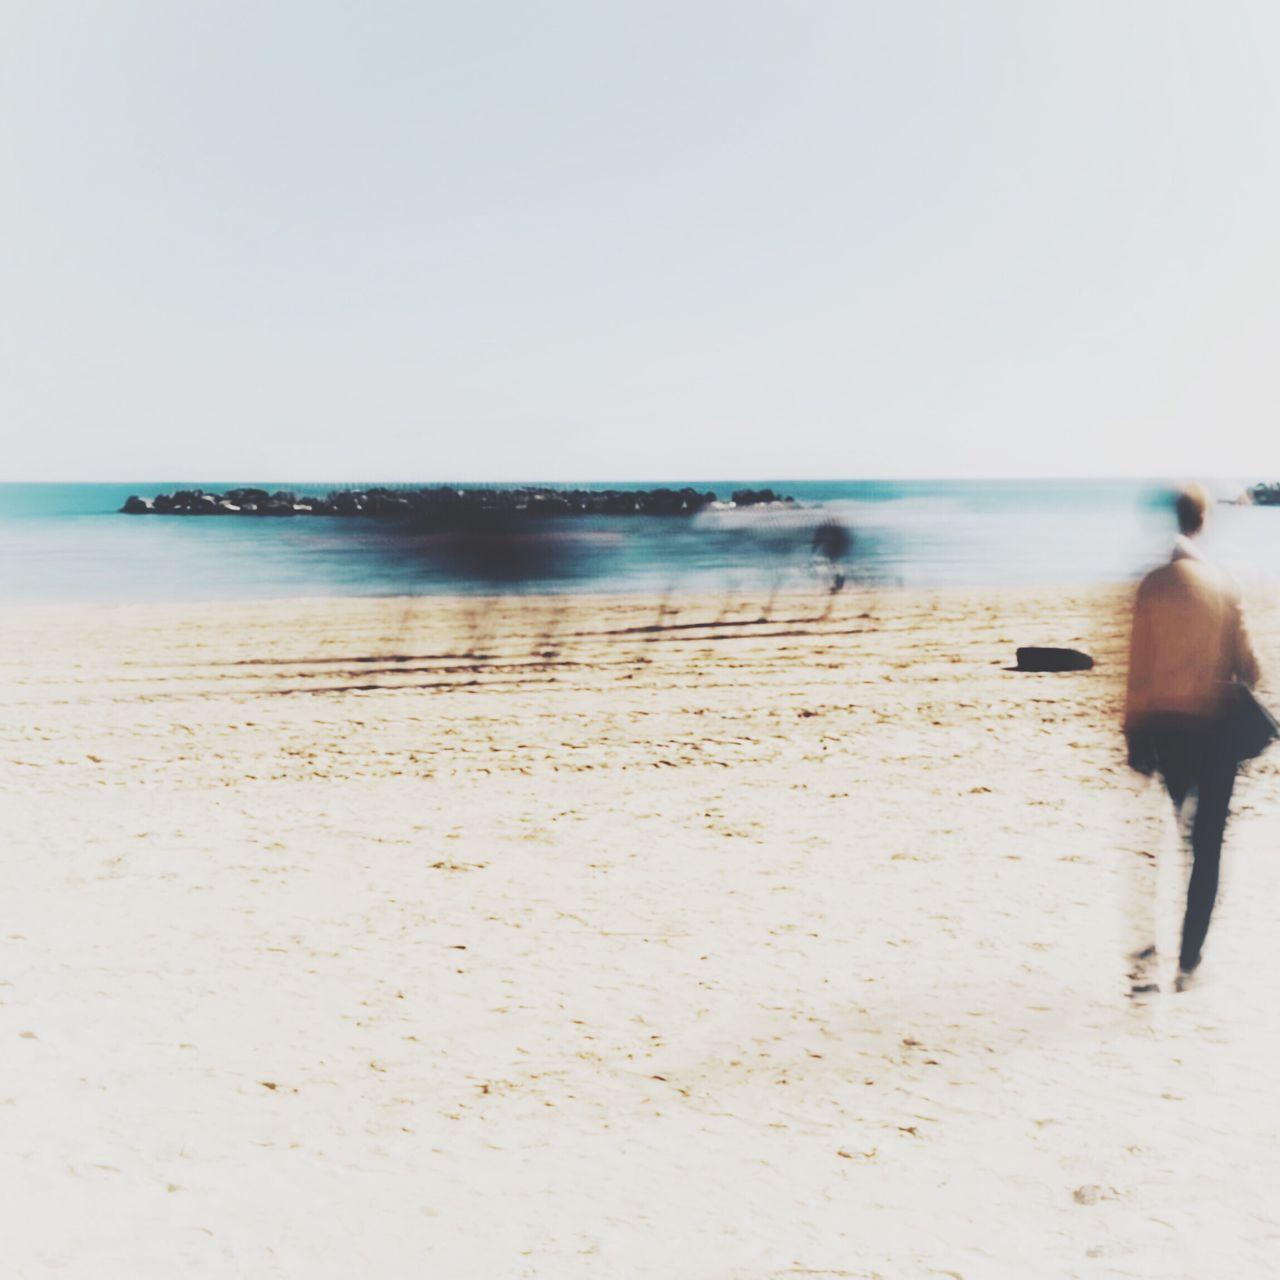 PEOPLE WALKING ON BEACH AGAINST CLEAR SKY